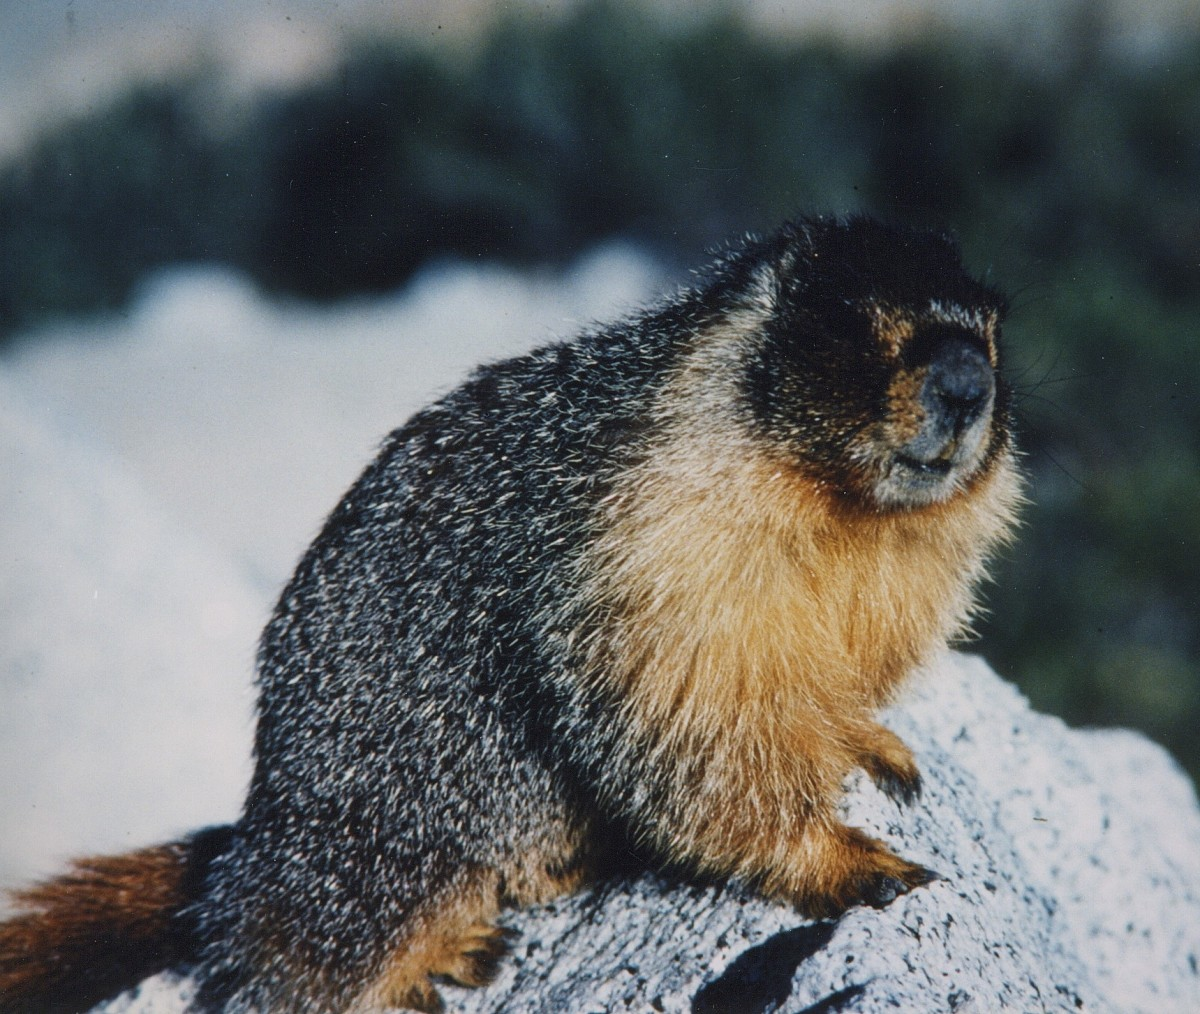 Mature yellow-bellied marmot (Marmota flaviventris)